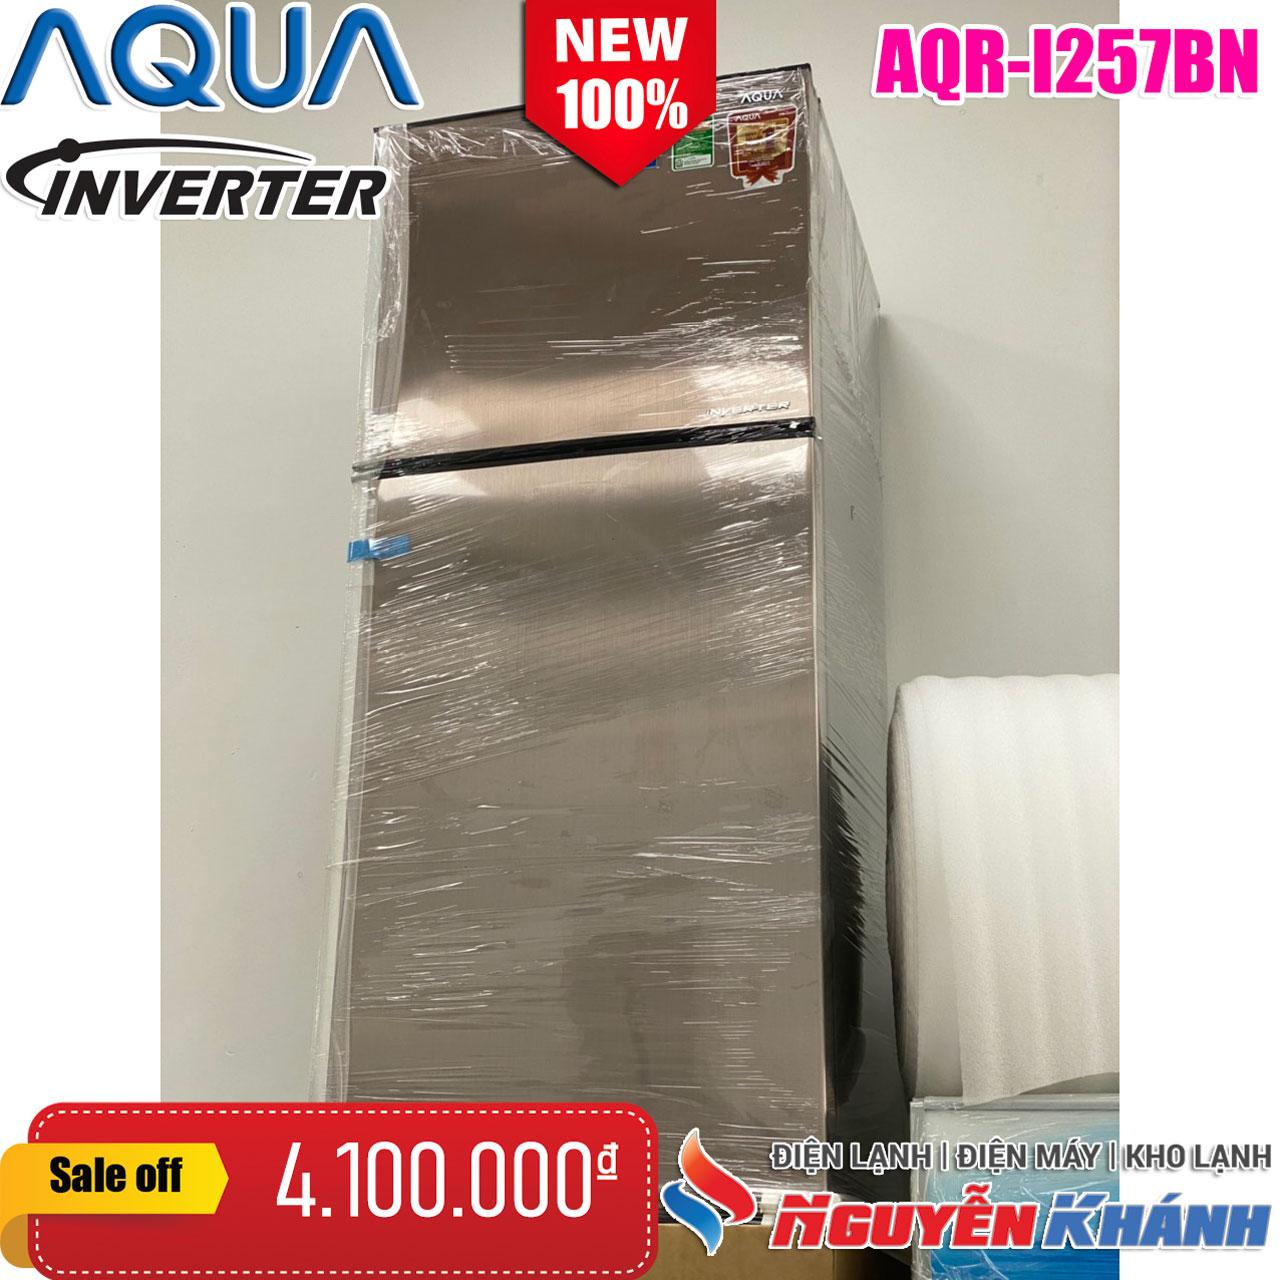 Tủ lạnh Aqua Inverter 252 lít AQR-I257BN